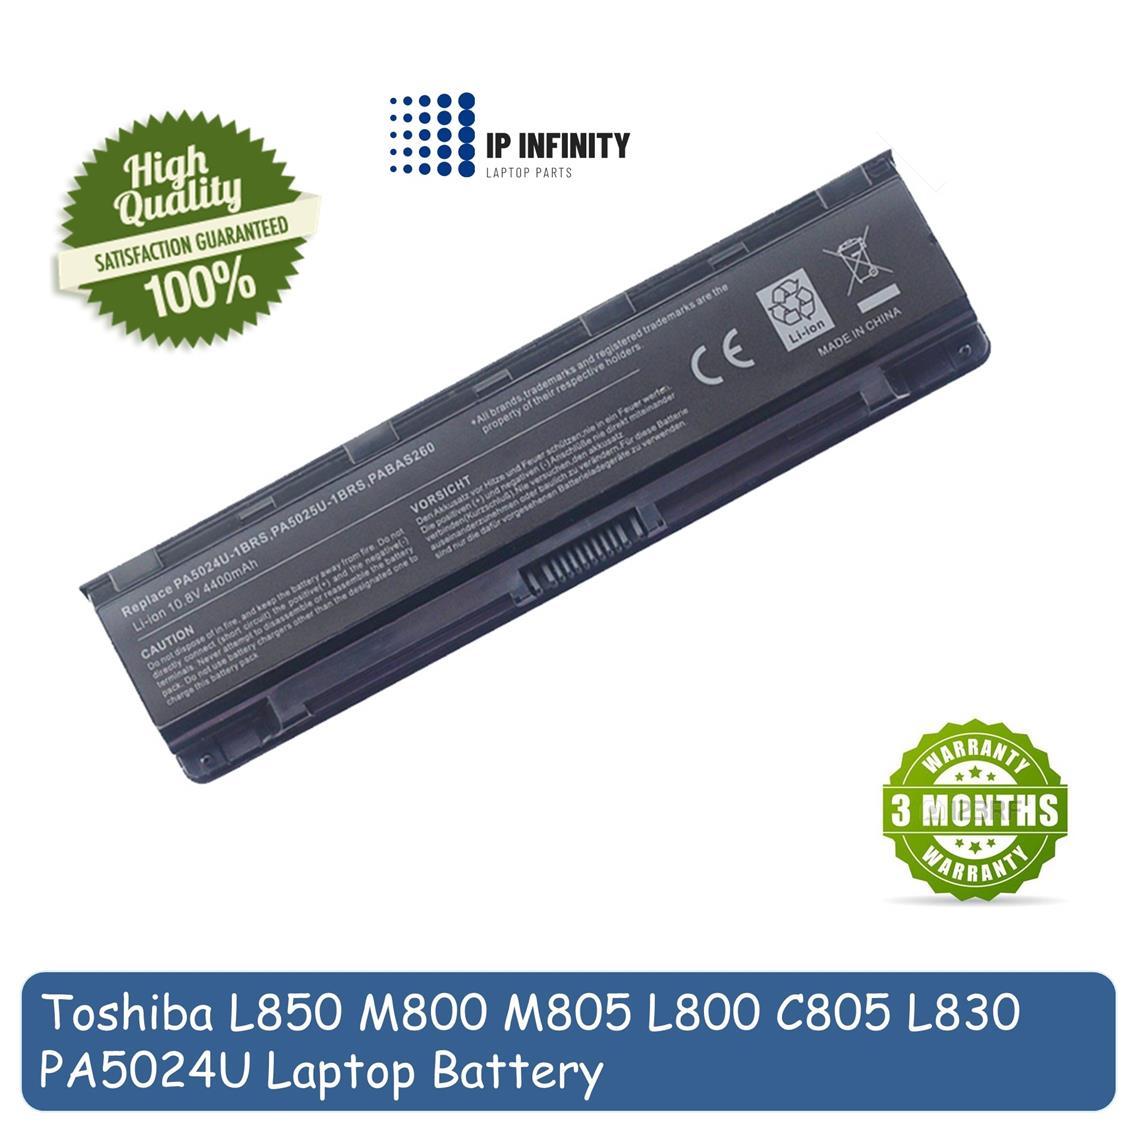 Toshiba Original Battery Satellite C800 L800 P800 S800 Pa5024 Baterai C800d C840 C840d C845 C870 L805 L830 L835 L840 L845 L850 M840 M805 M800 P870 S70 P845 Laptop